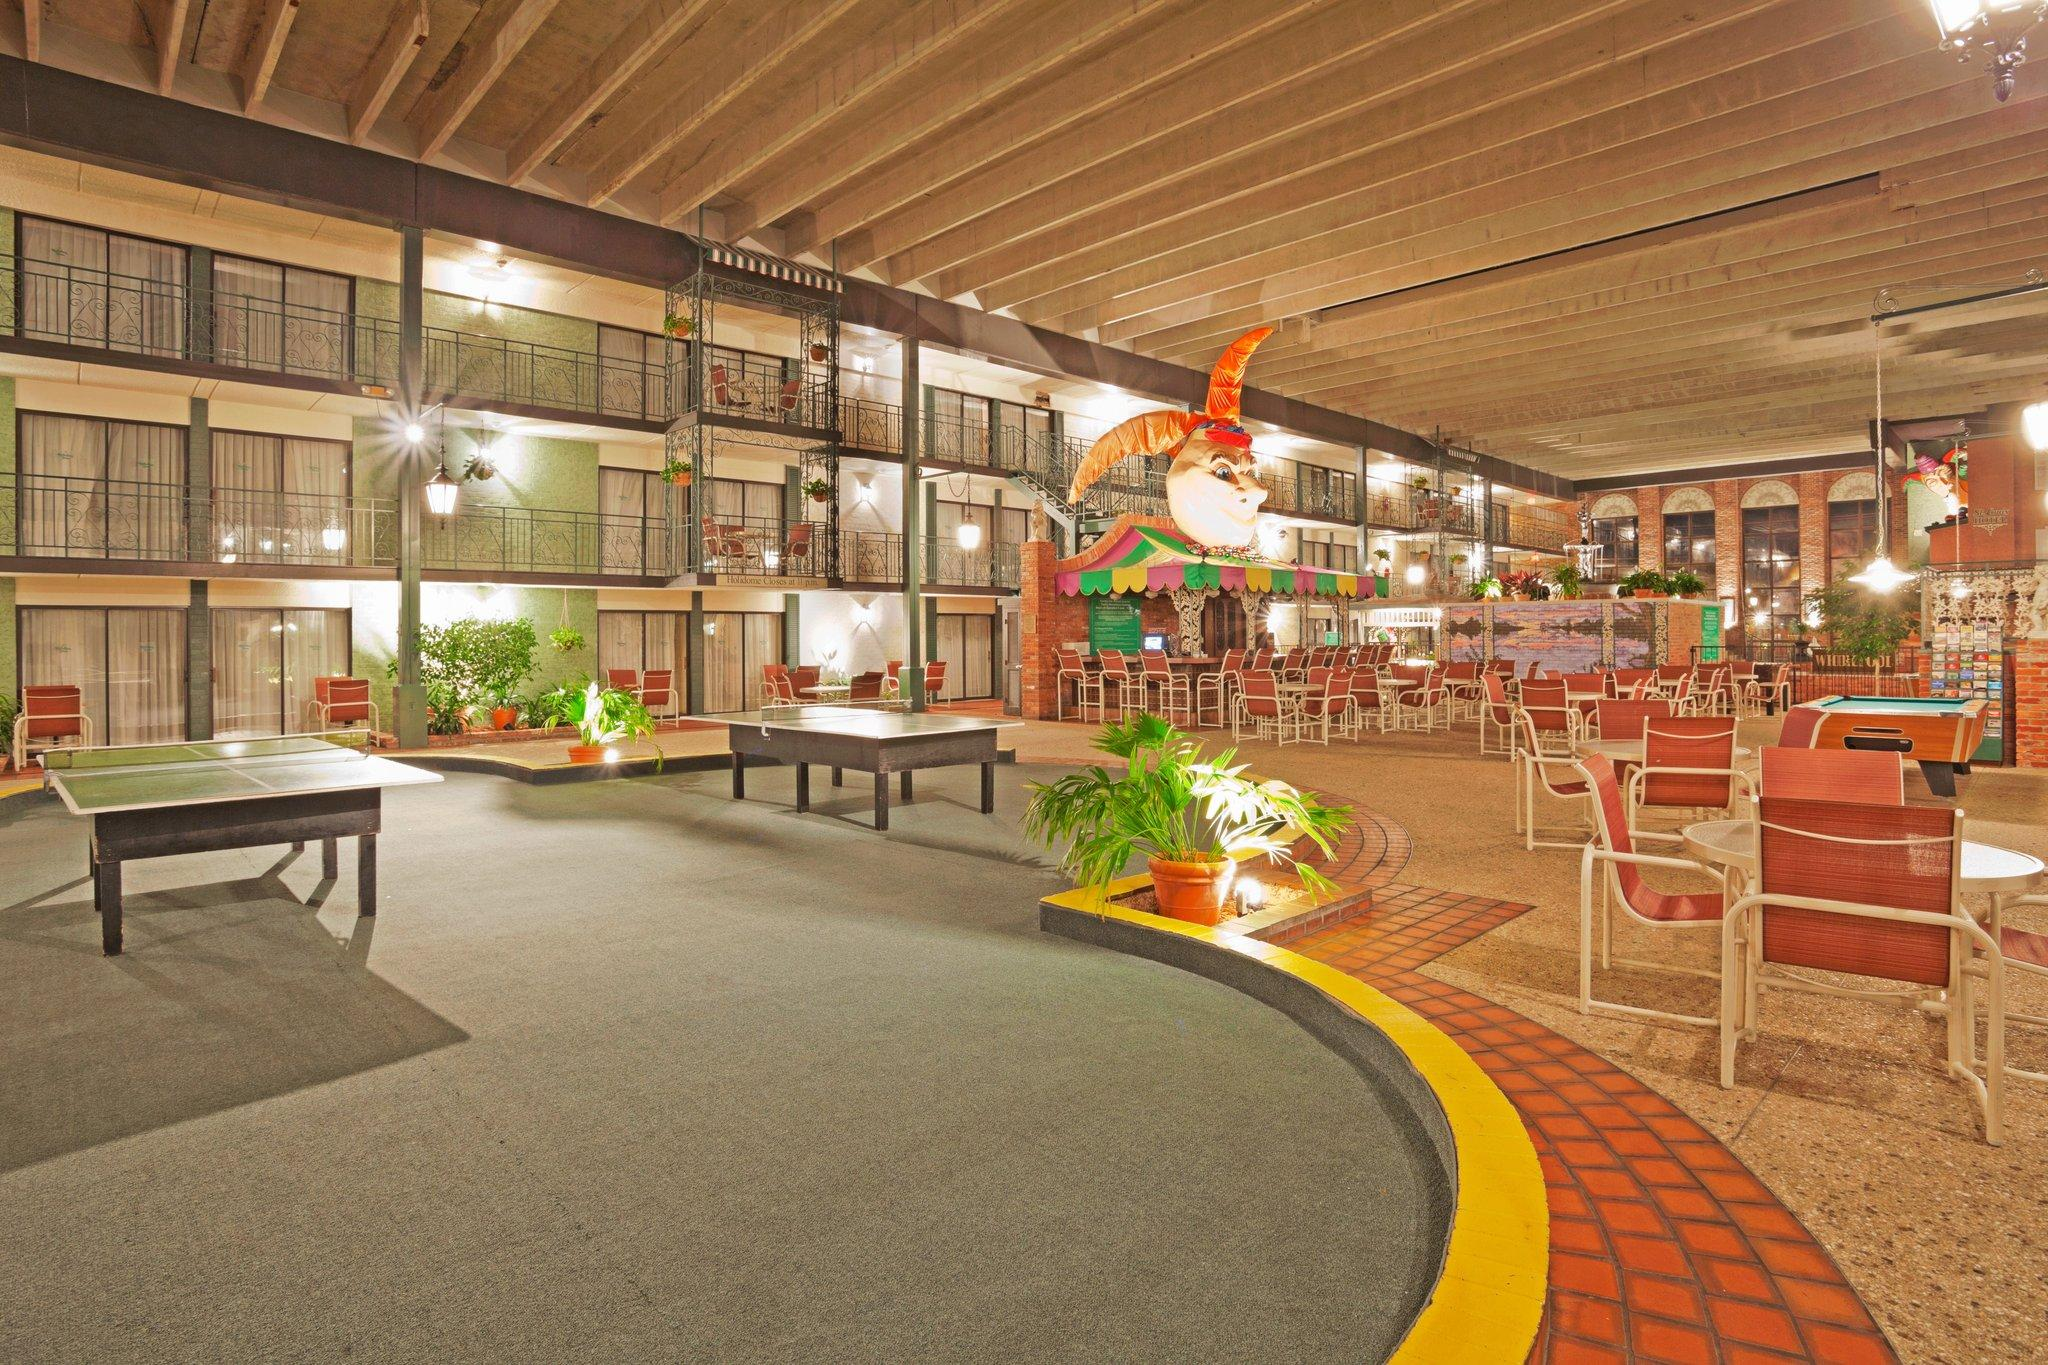 Holiday Inn Perrysburg - French Quarter